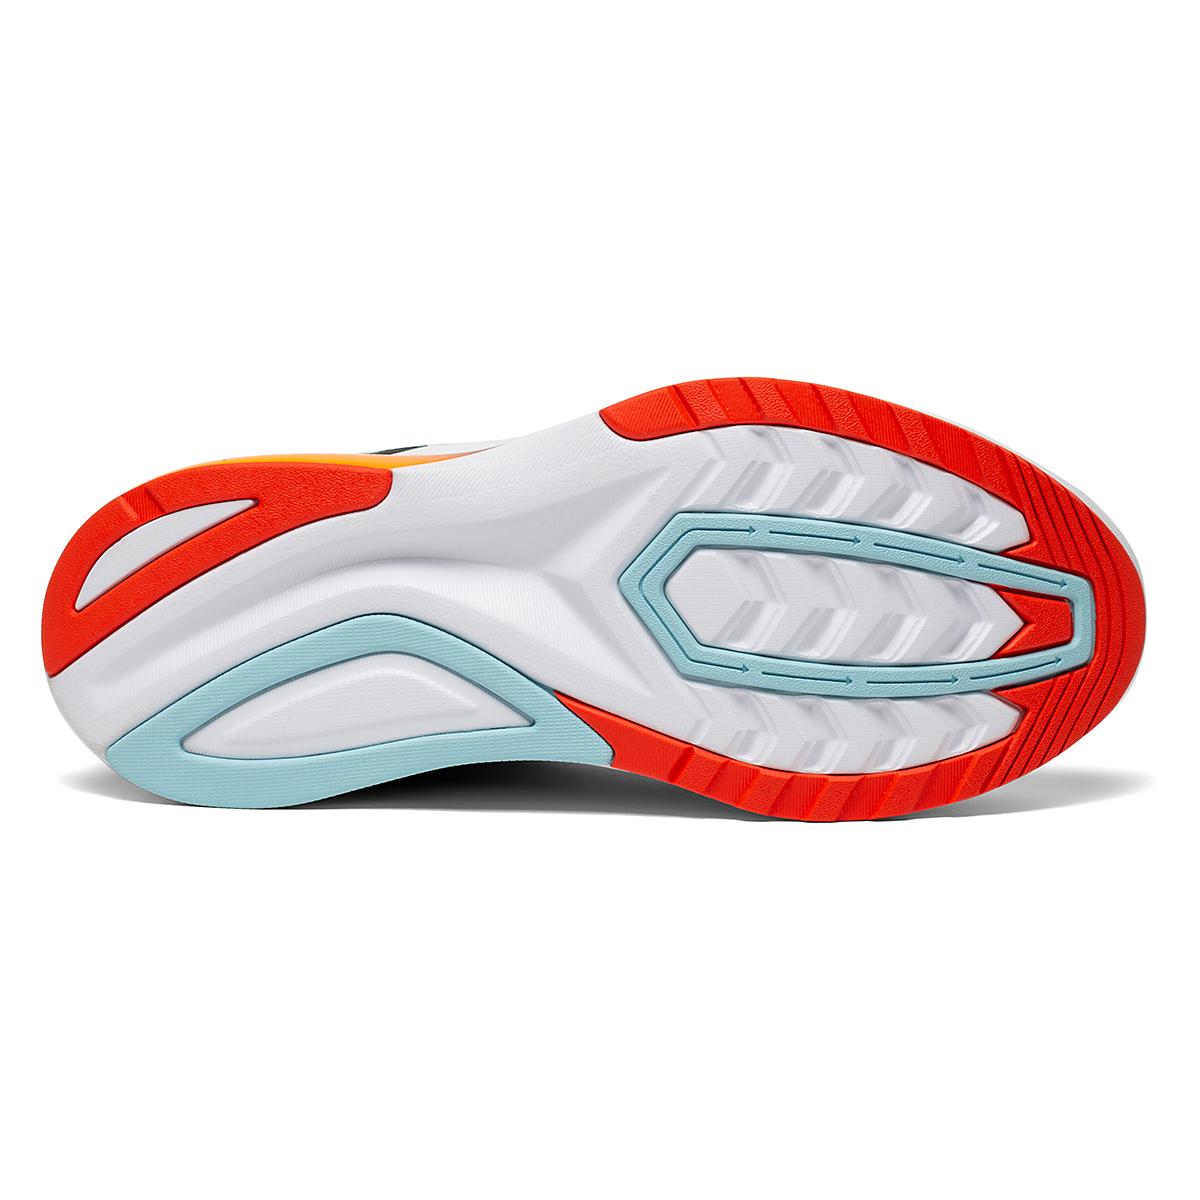 Women's Saucony Endorphin Shift 2 Running Shoe - Color: Powder/Scarlet - Size: 5 - Width: Regular, Powder/Scarlet, large, image 4